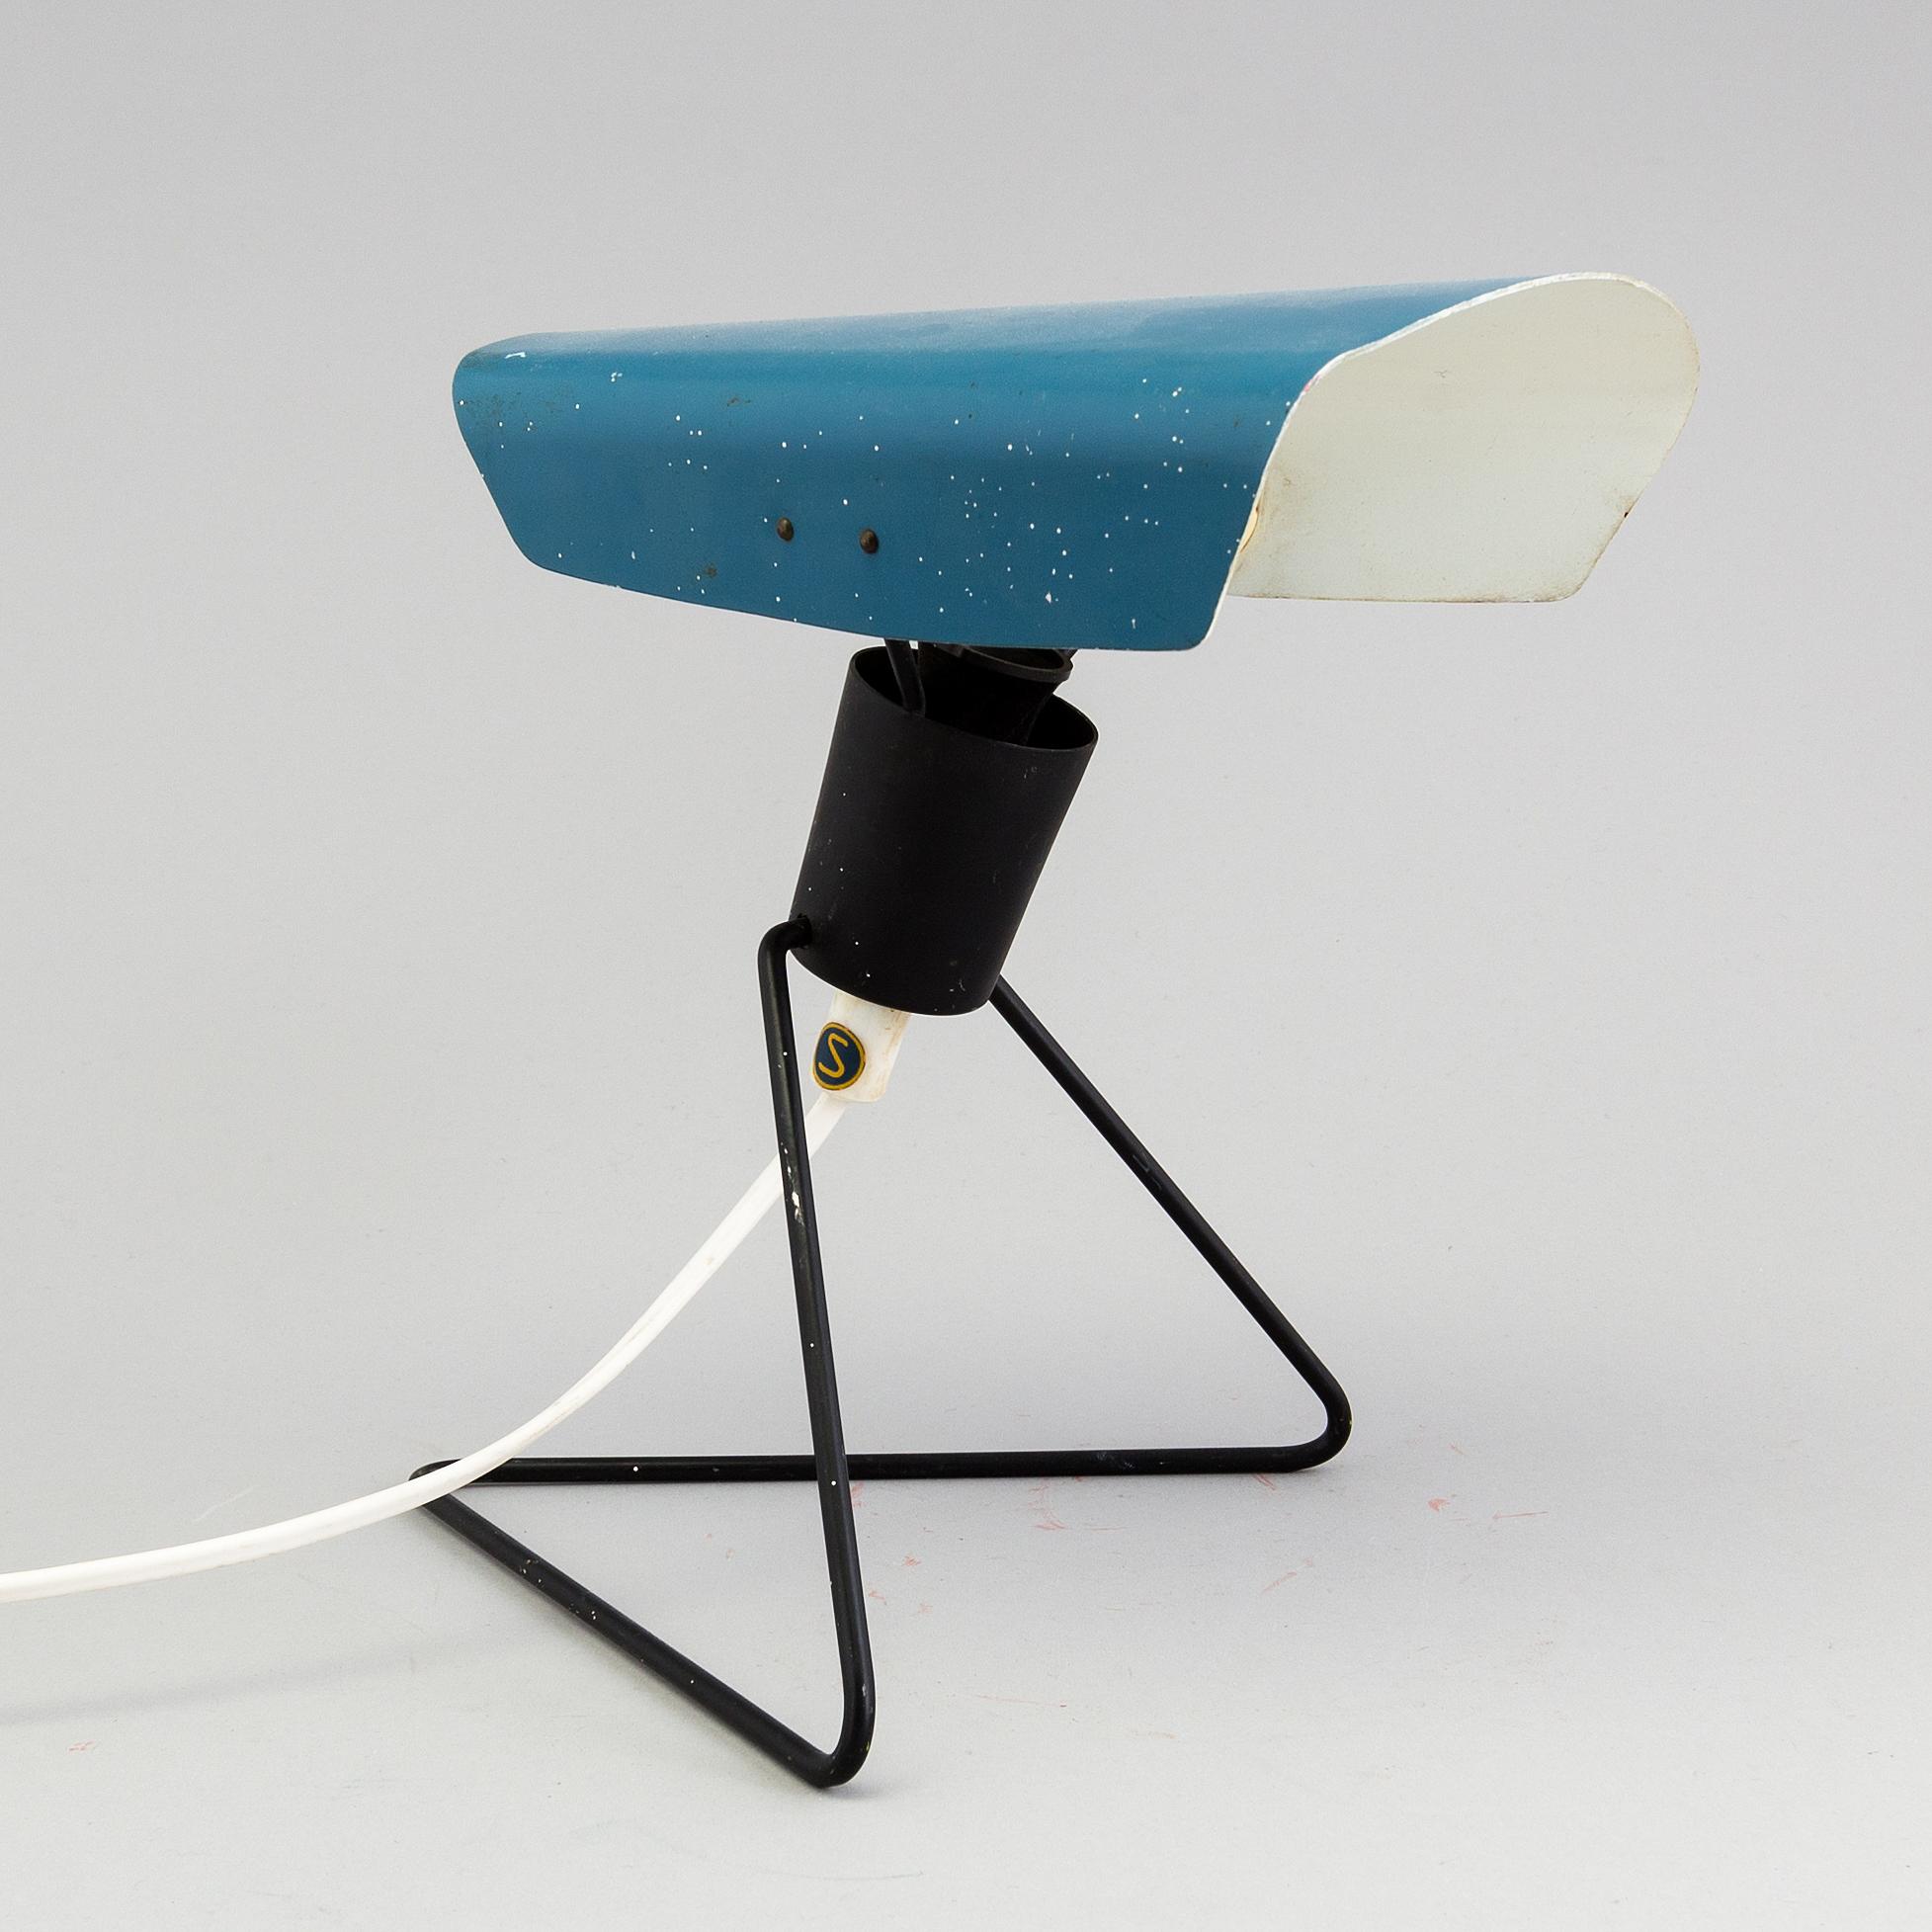 auktionstipset - bordslampa falkenbergs belysning, 1960-tal.